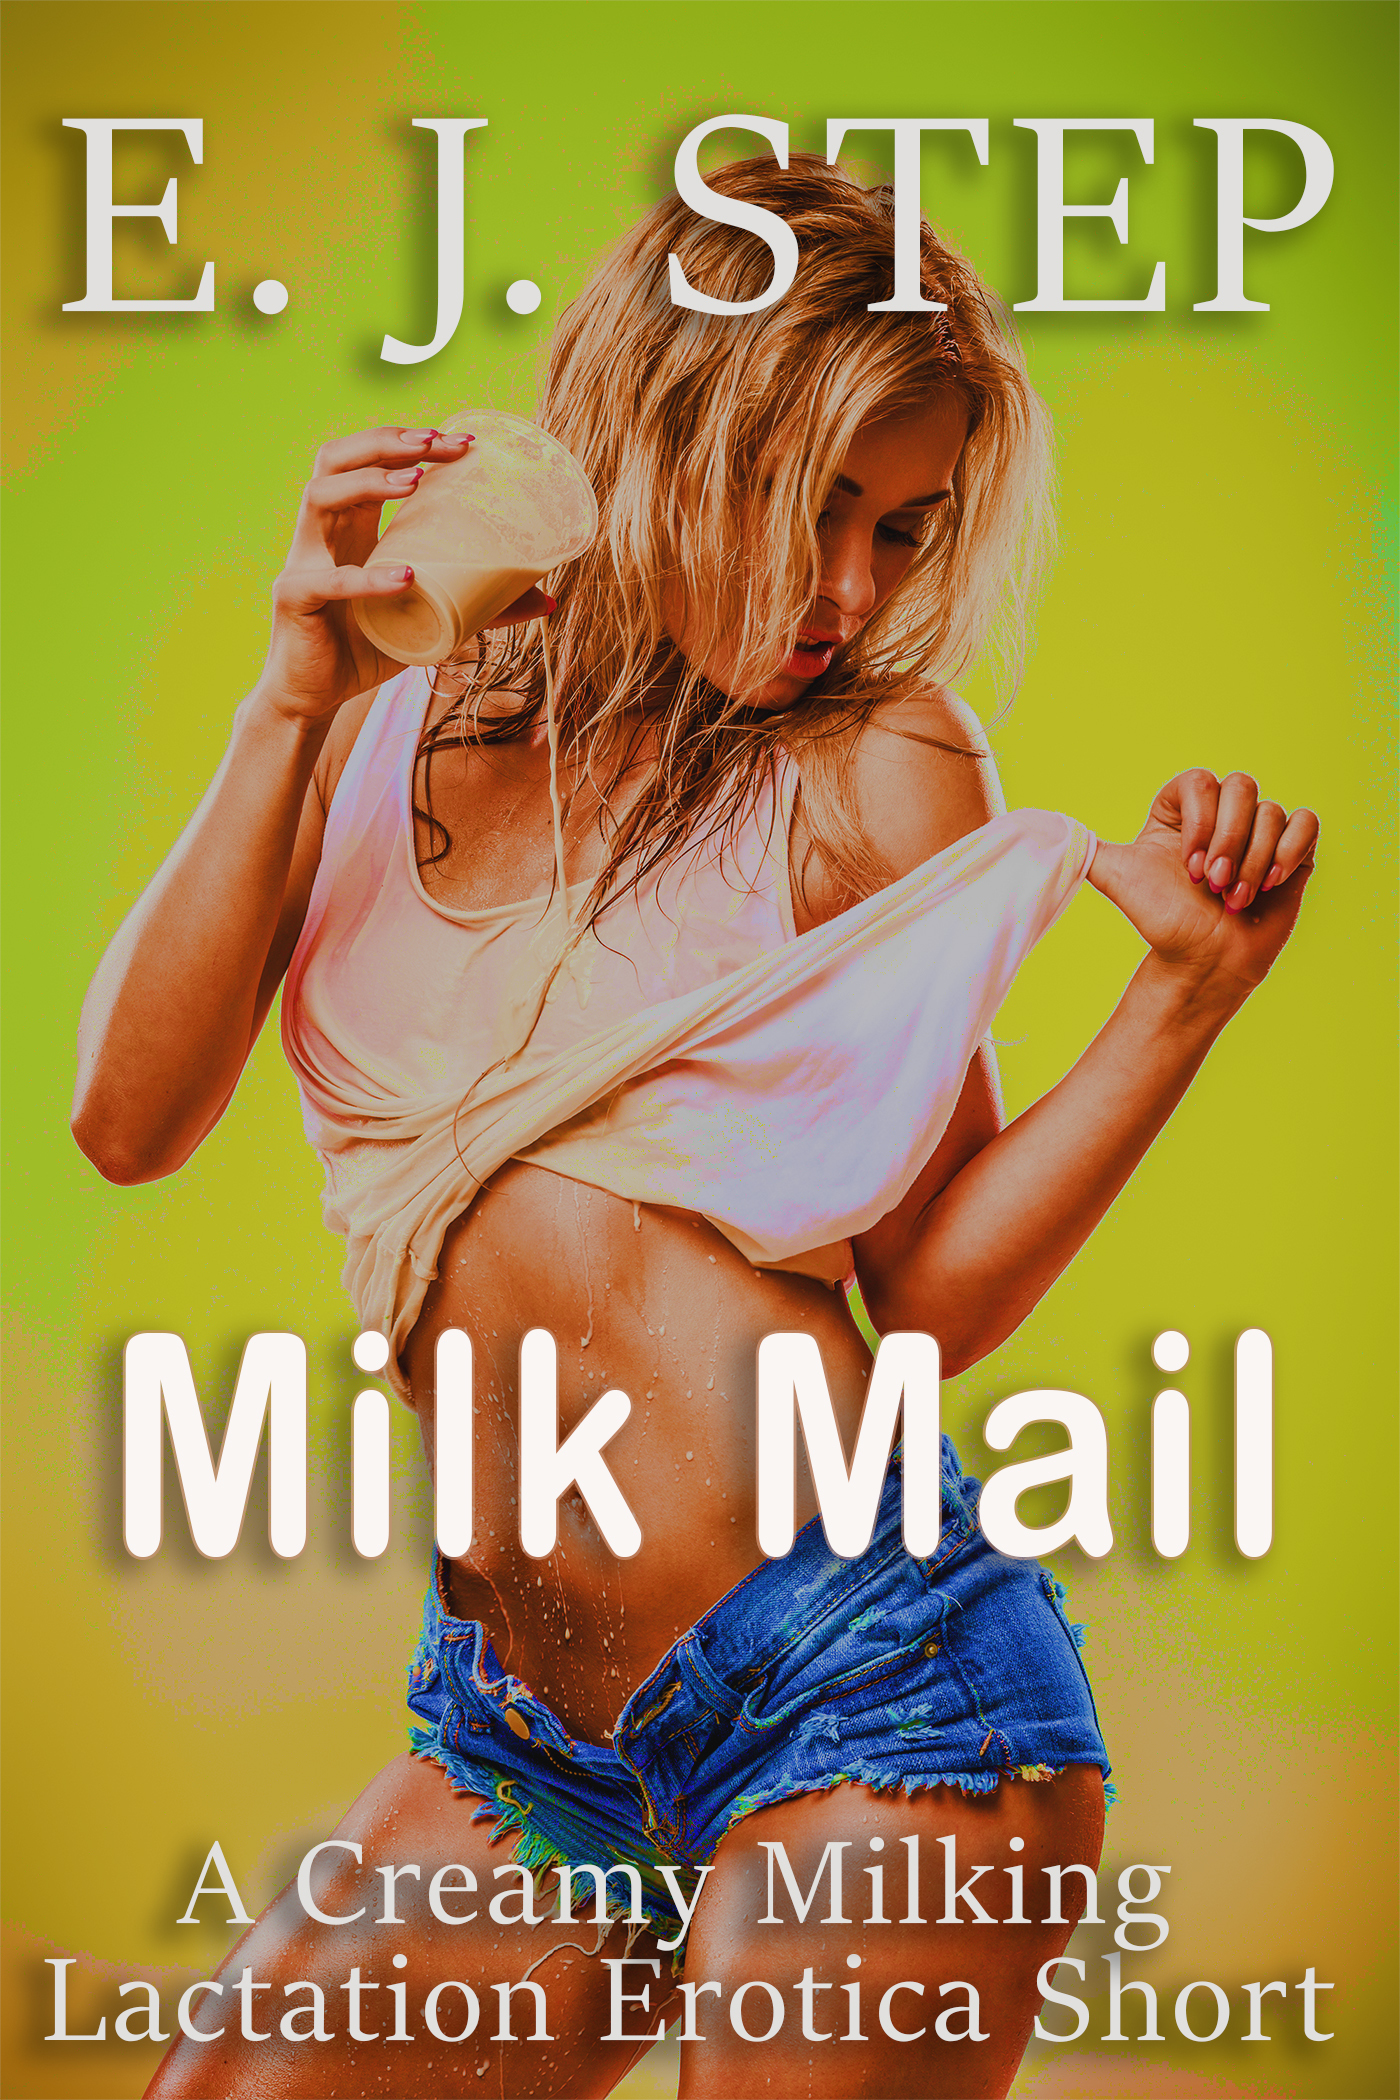 Milk Mail: A Creamy Milking Lactation Erotica Short  by  E J Step